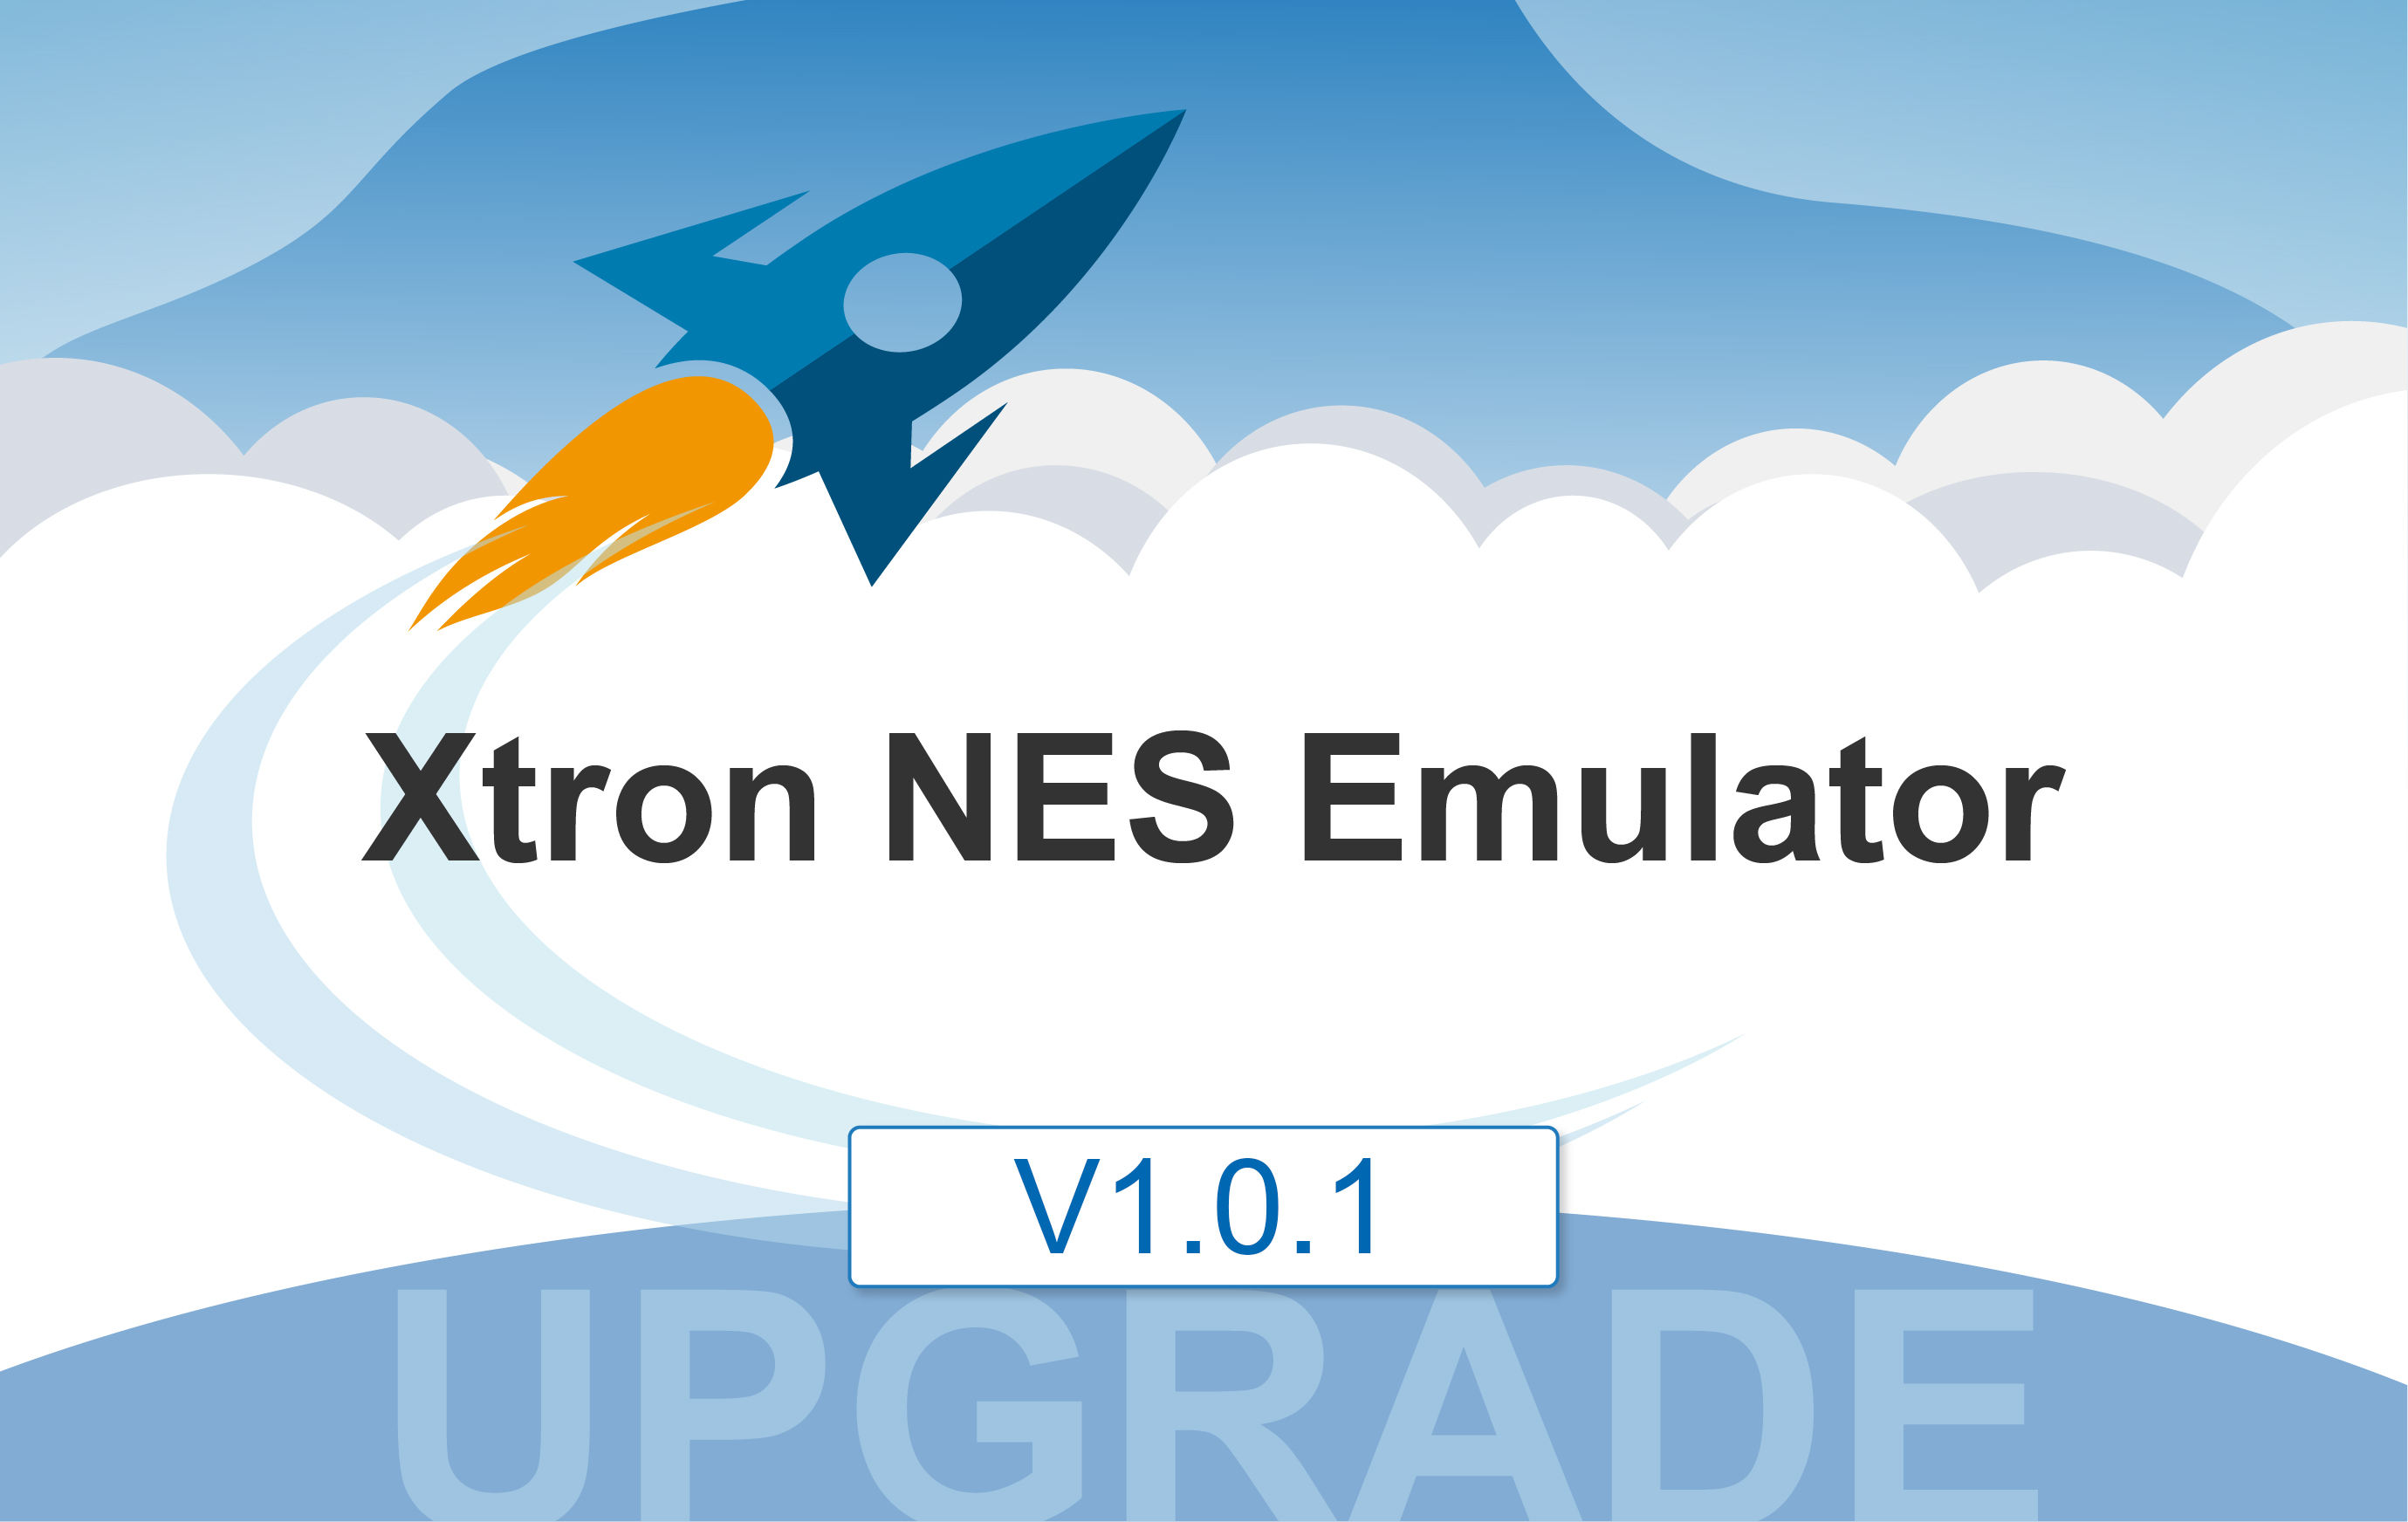 Xtron NES Emulator v1.0.1 has released